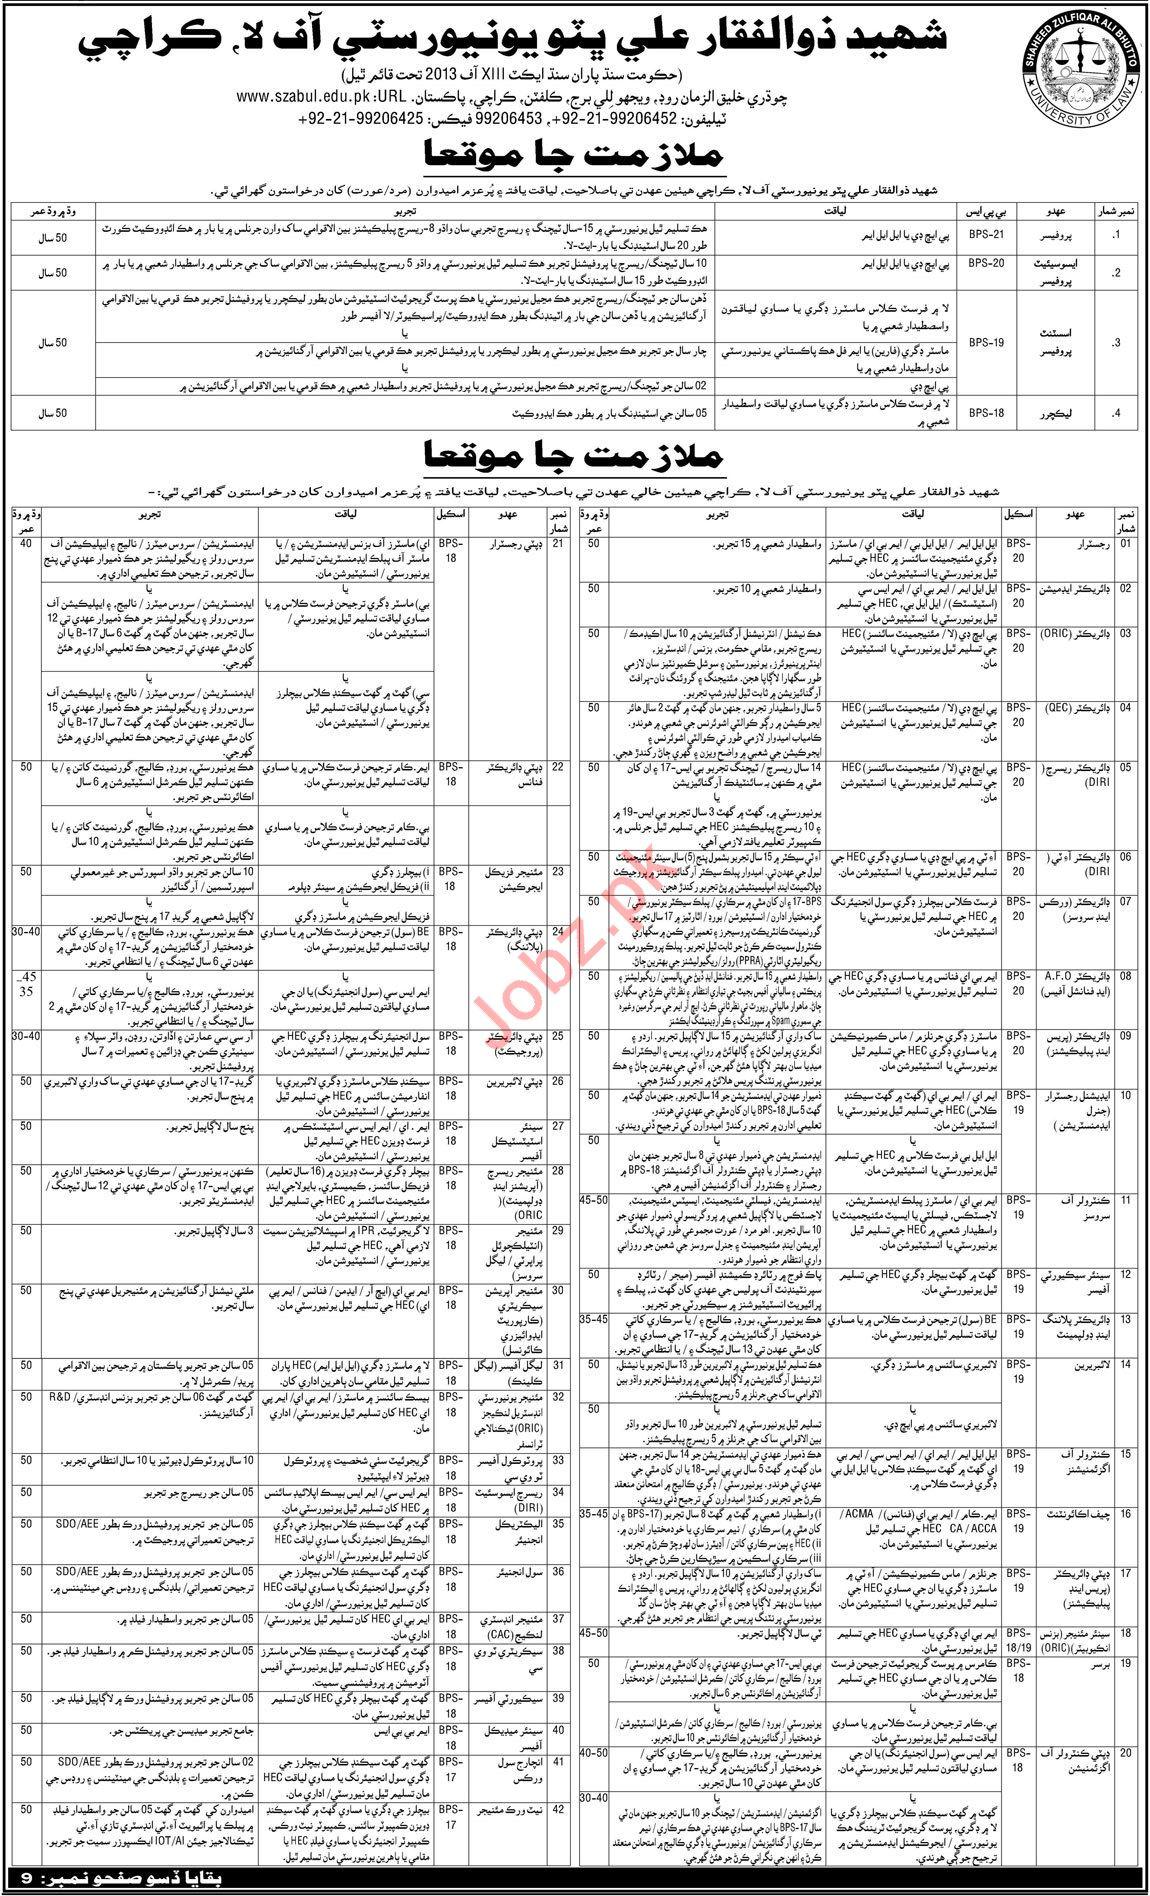 Shaheed Zulfiqar Ali Bhutto University of Law Jobs 2019